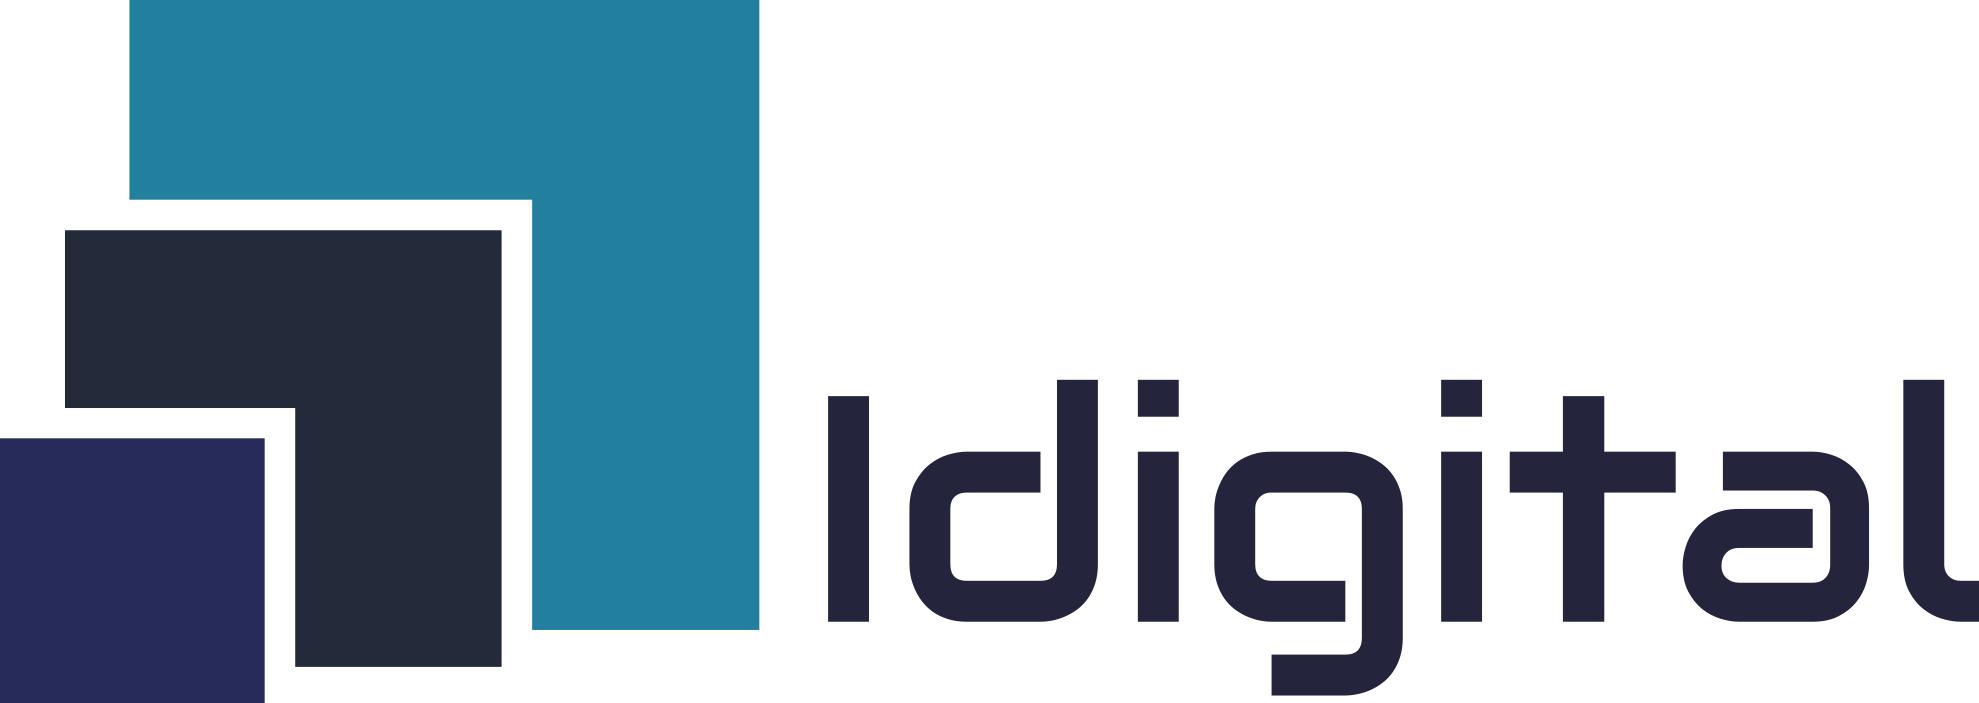 www.idigitalsolutionsltd.com